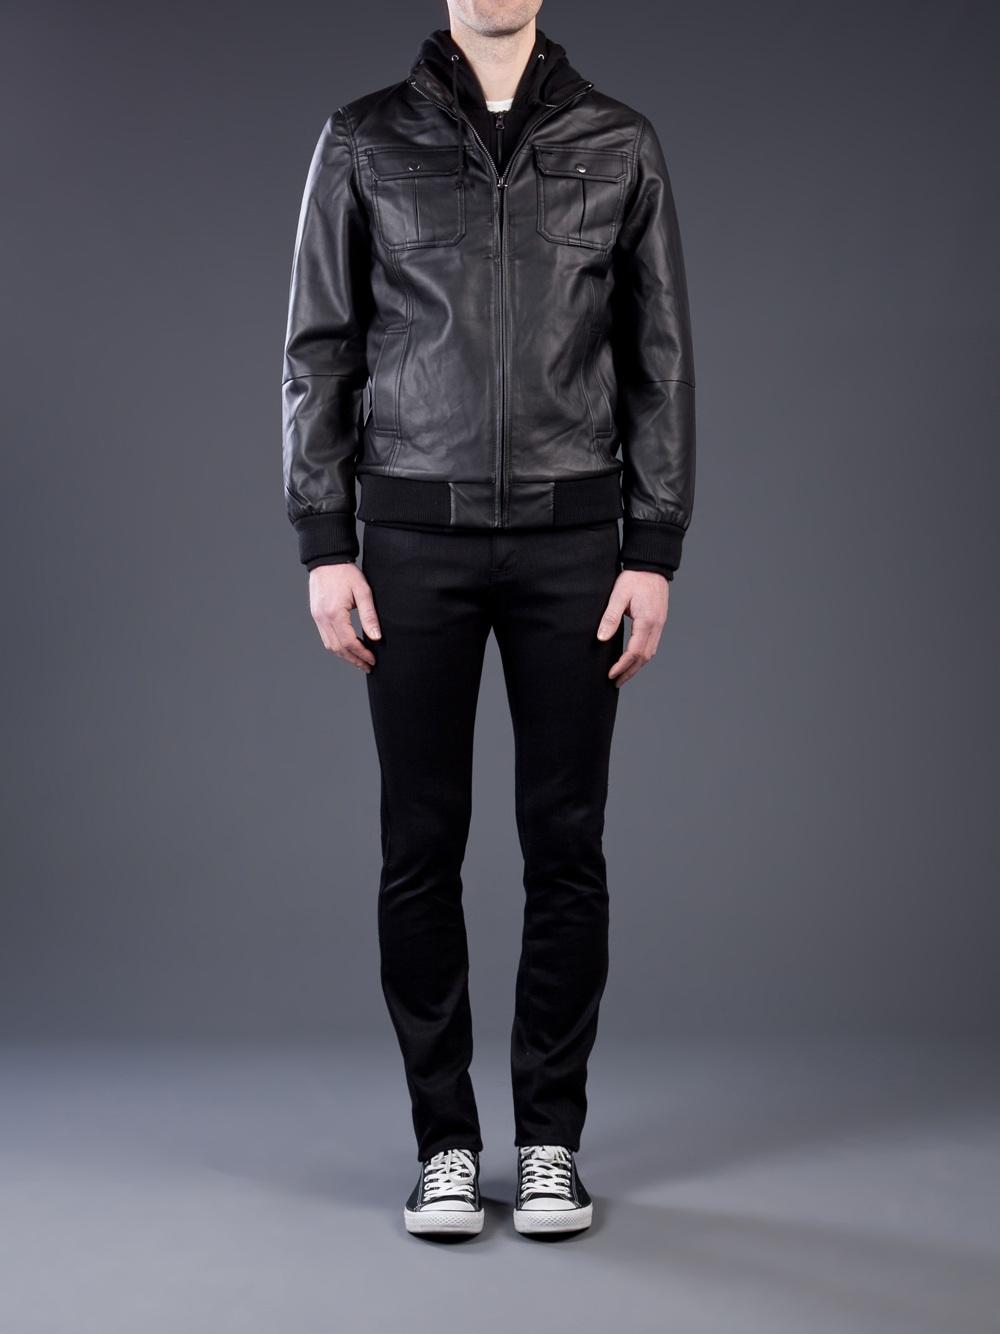 Obey Rapture Faux Leather Jacket in Black for Men